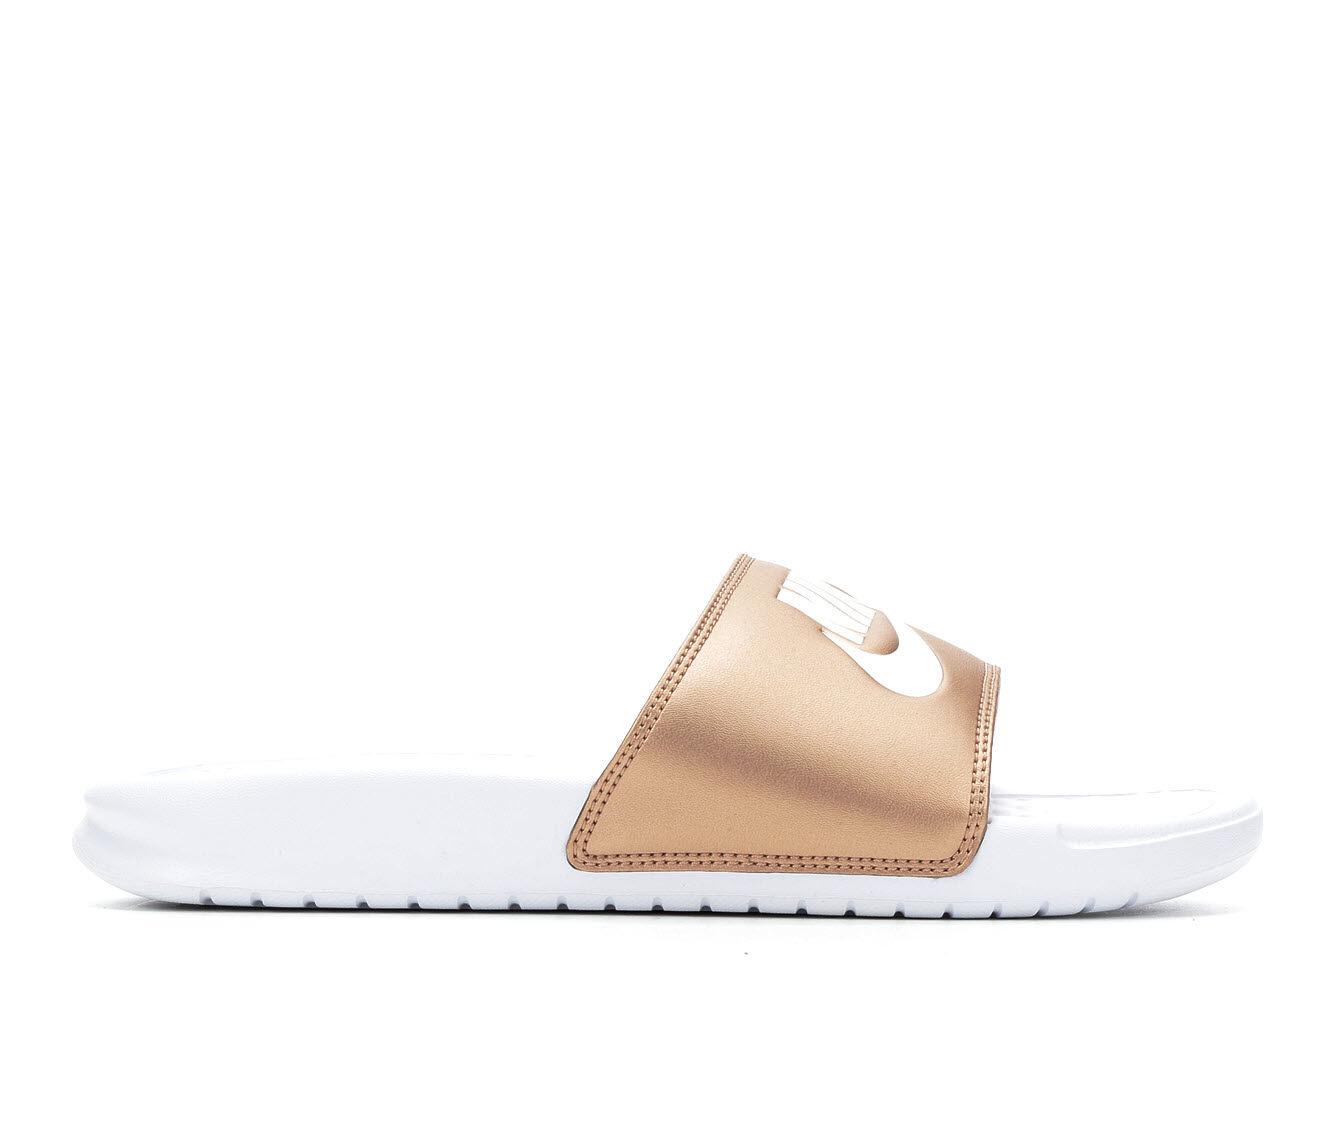 Women's Nike Benassi JDI Slide Sandals White/MTLC Bron